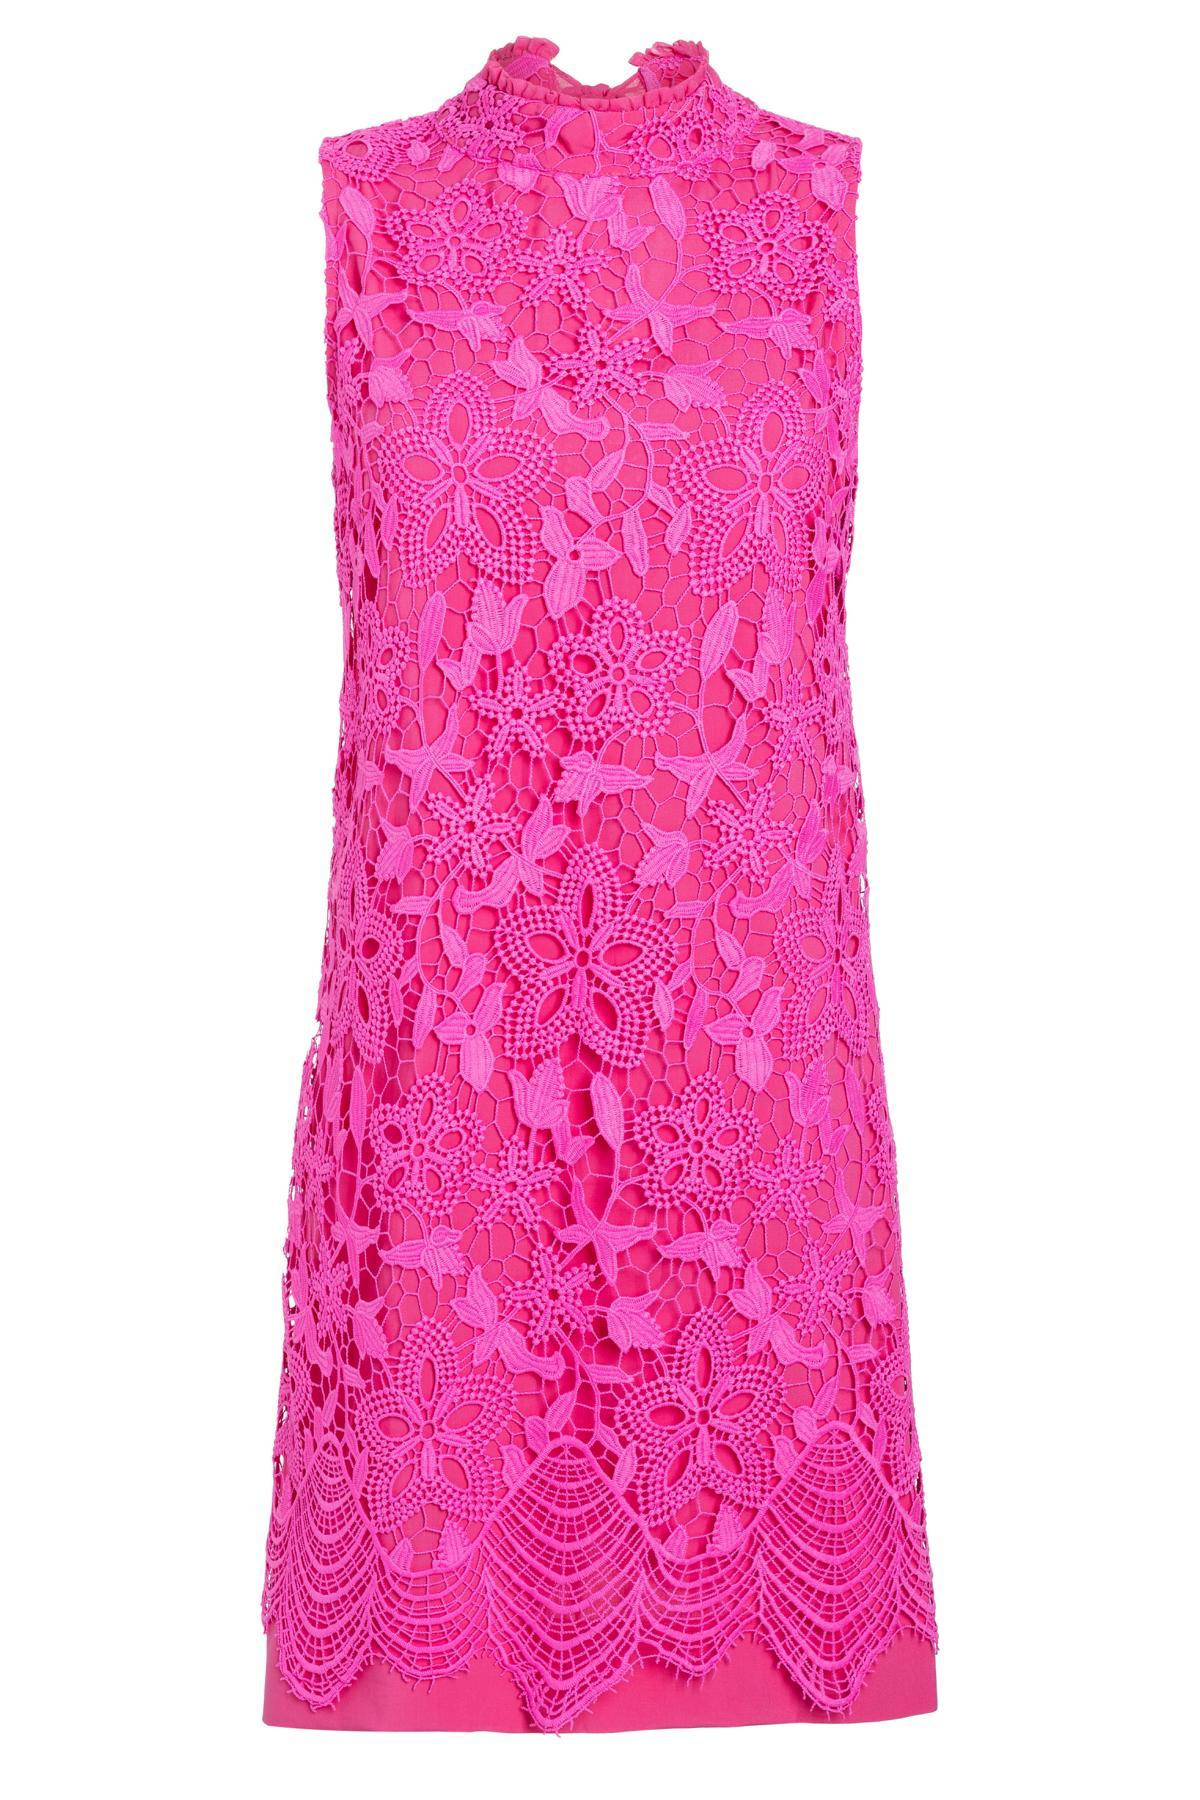 d1d1c16676d31d A-linje jurk Saguna van kant in pink